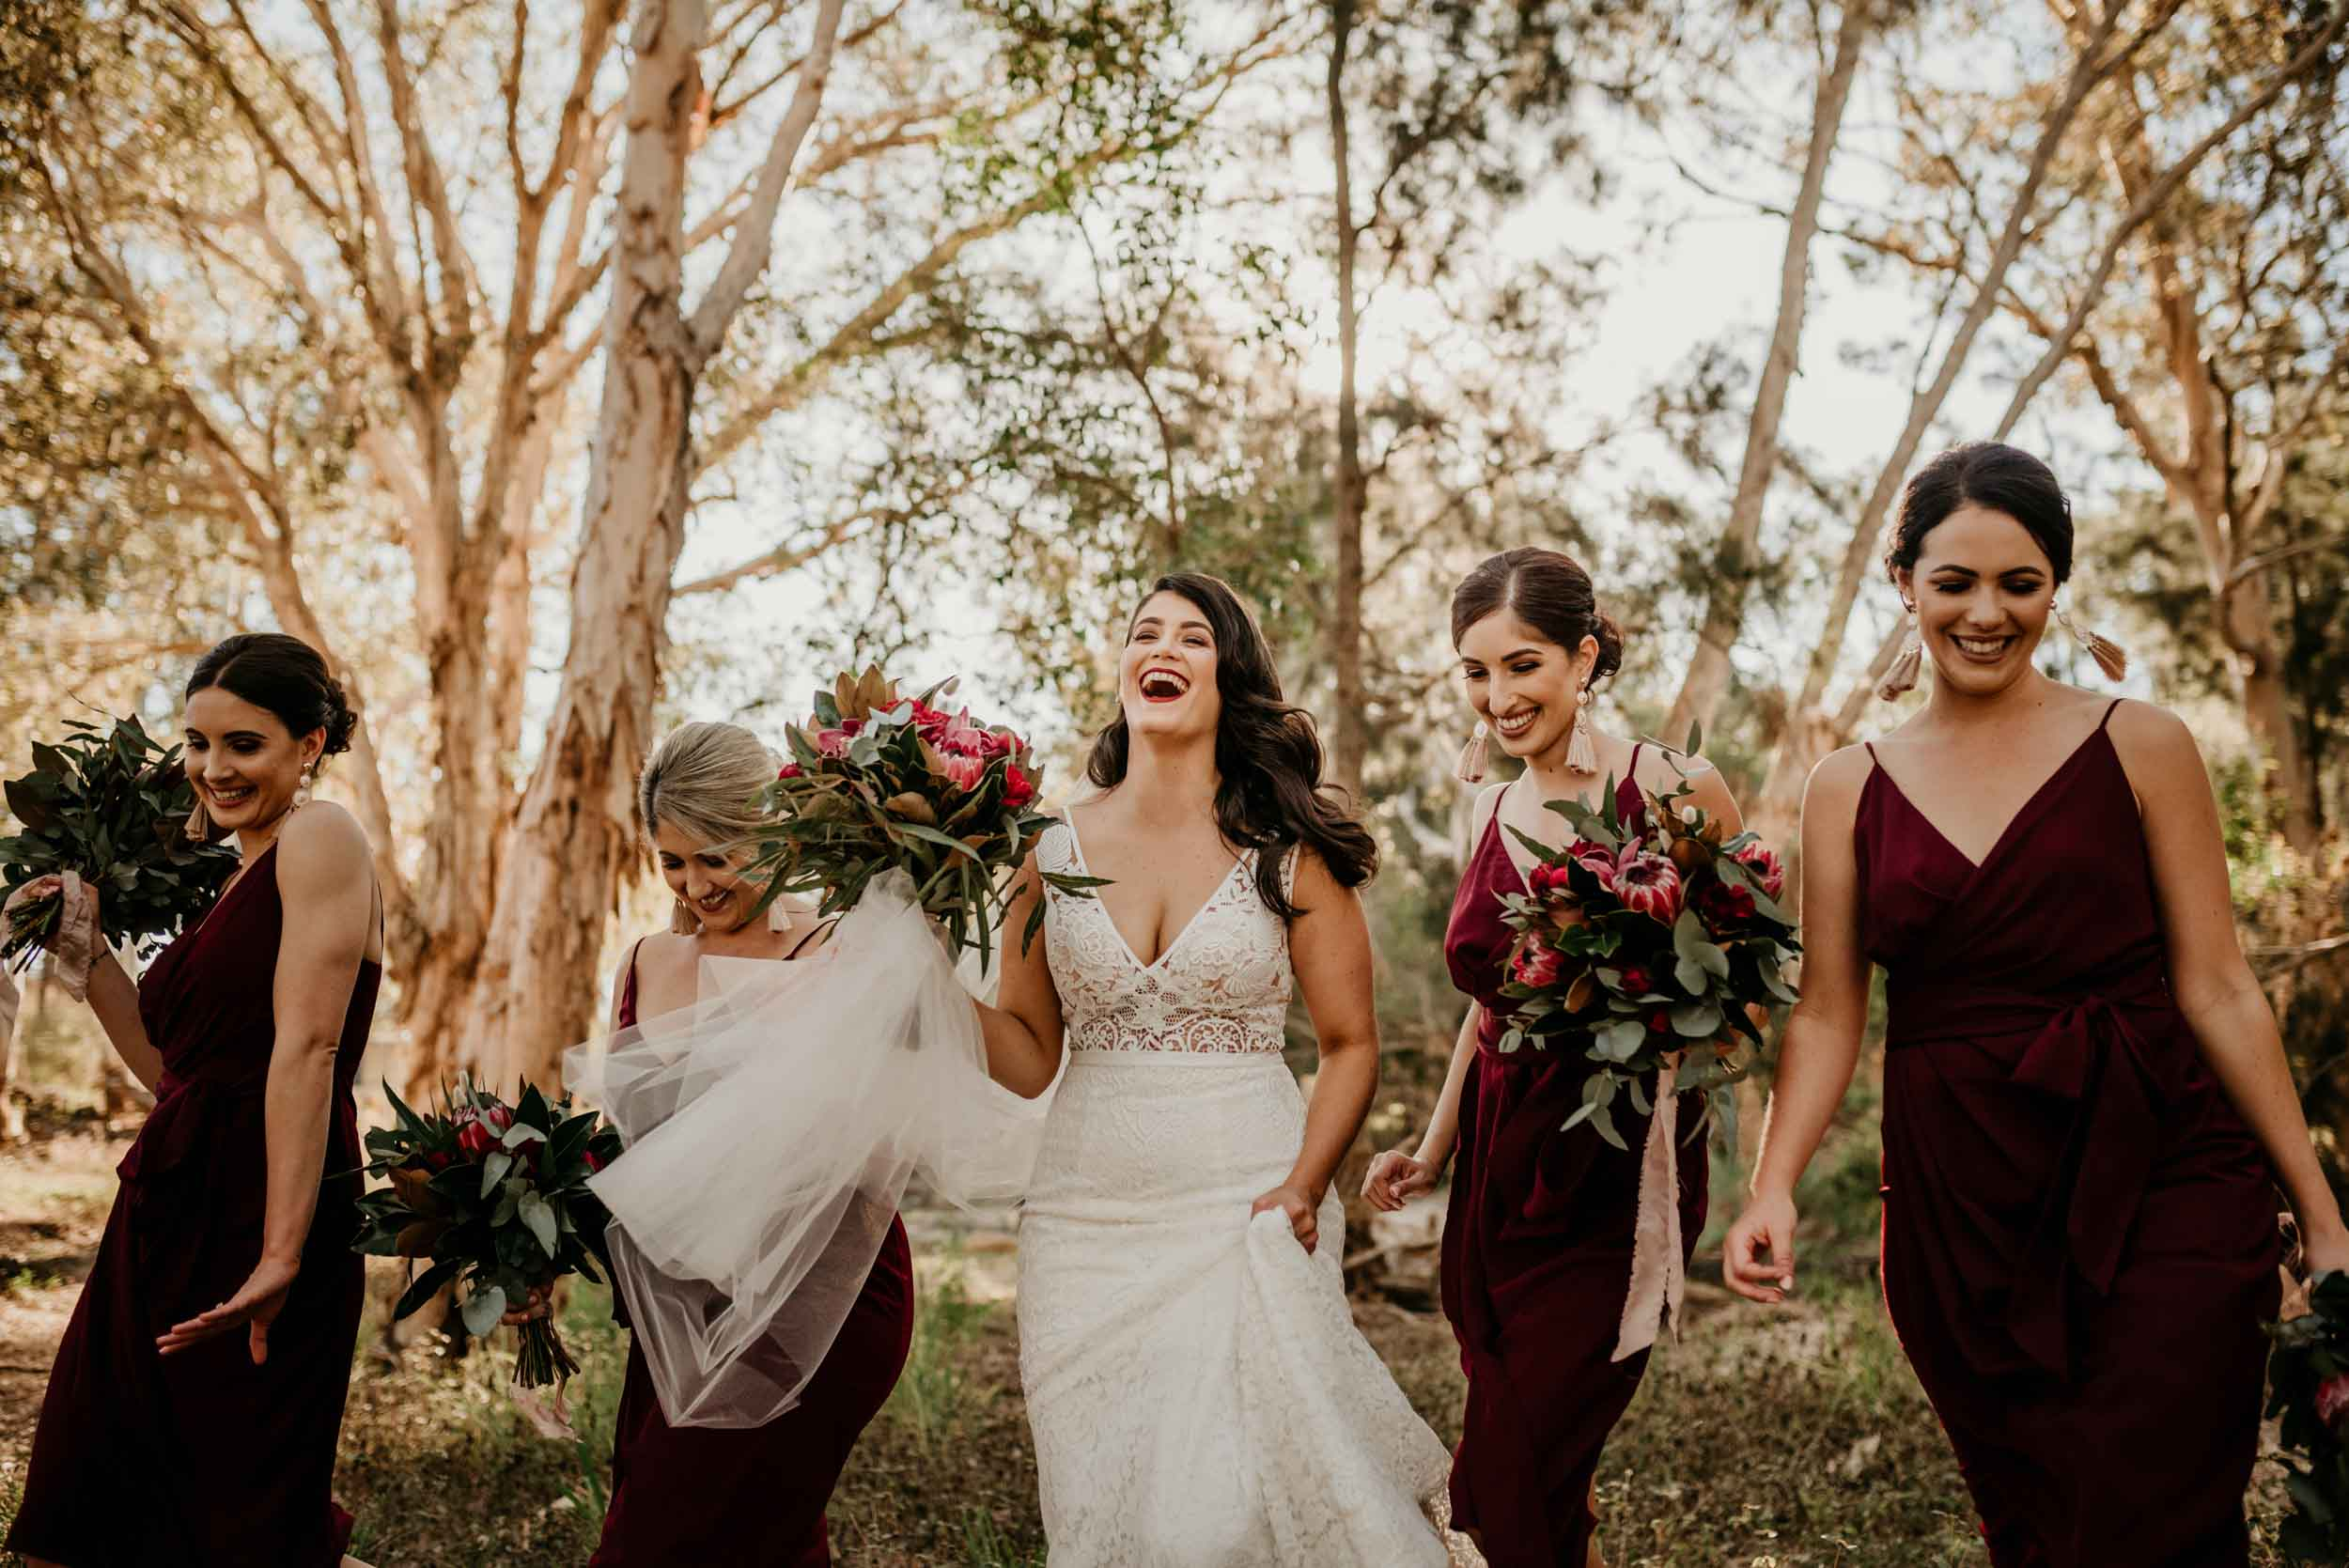 The Raw Photographer - Cairns Wedding Photographer - Atherton Tablelands - Mareeba farm Wedding - Irene Costa's Devine Bridal - Candid - Photo Package-30.jpg